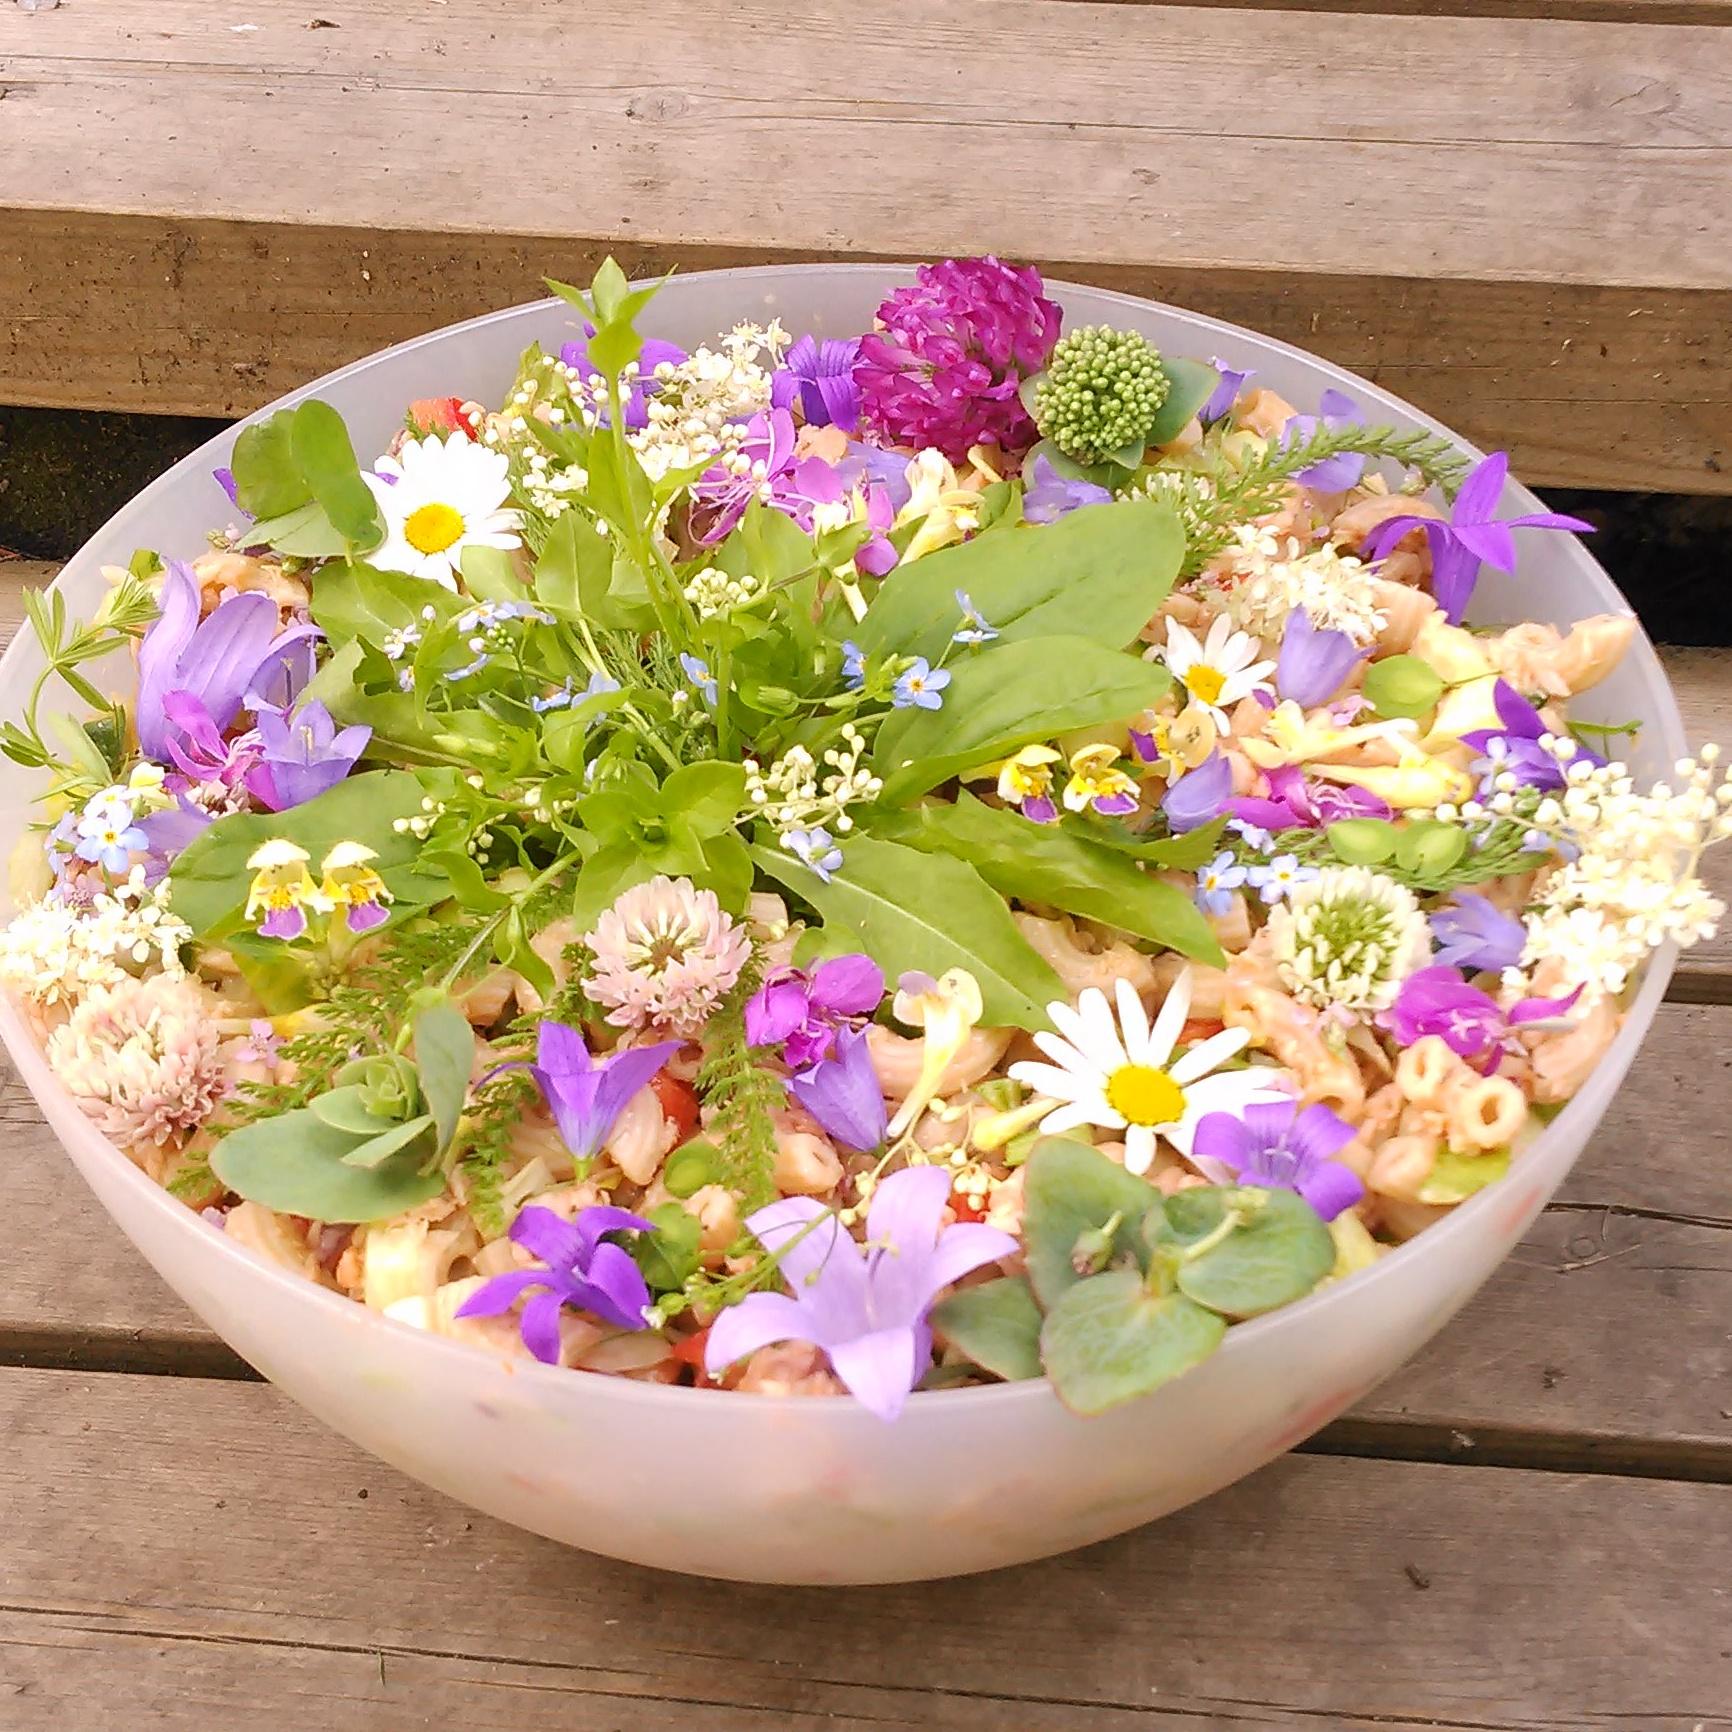 Blomstrende pastasalat